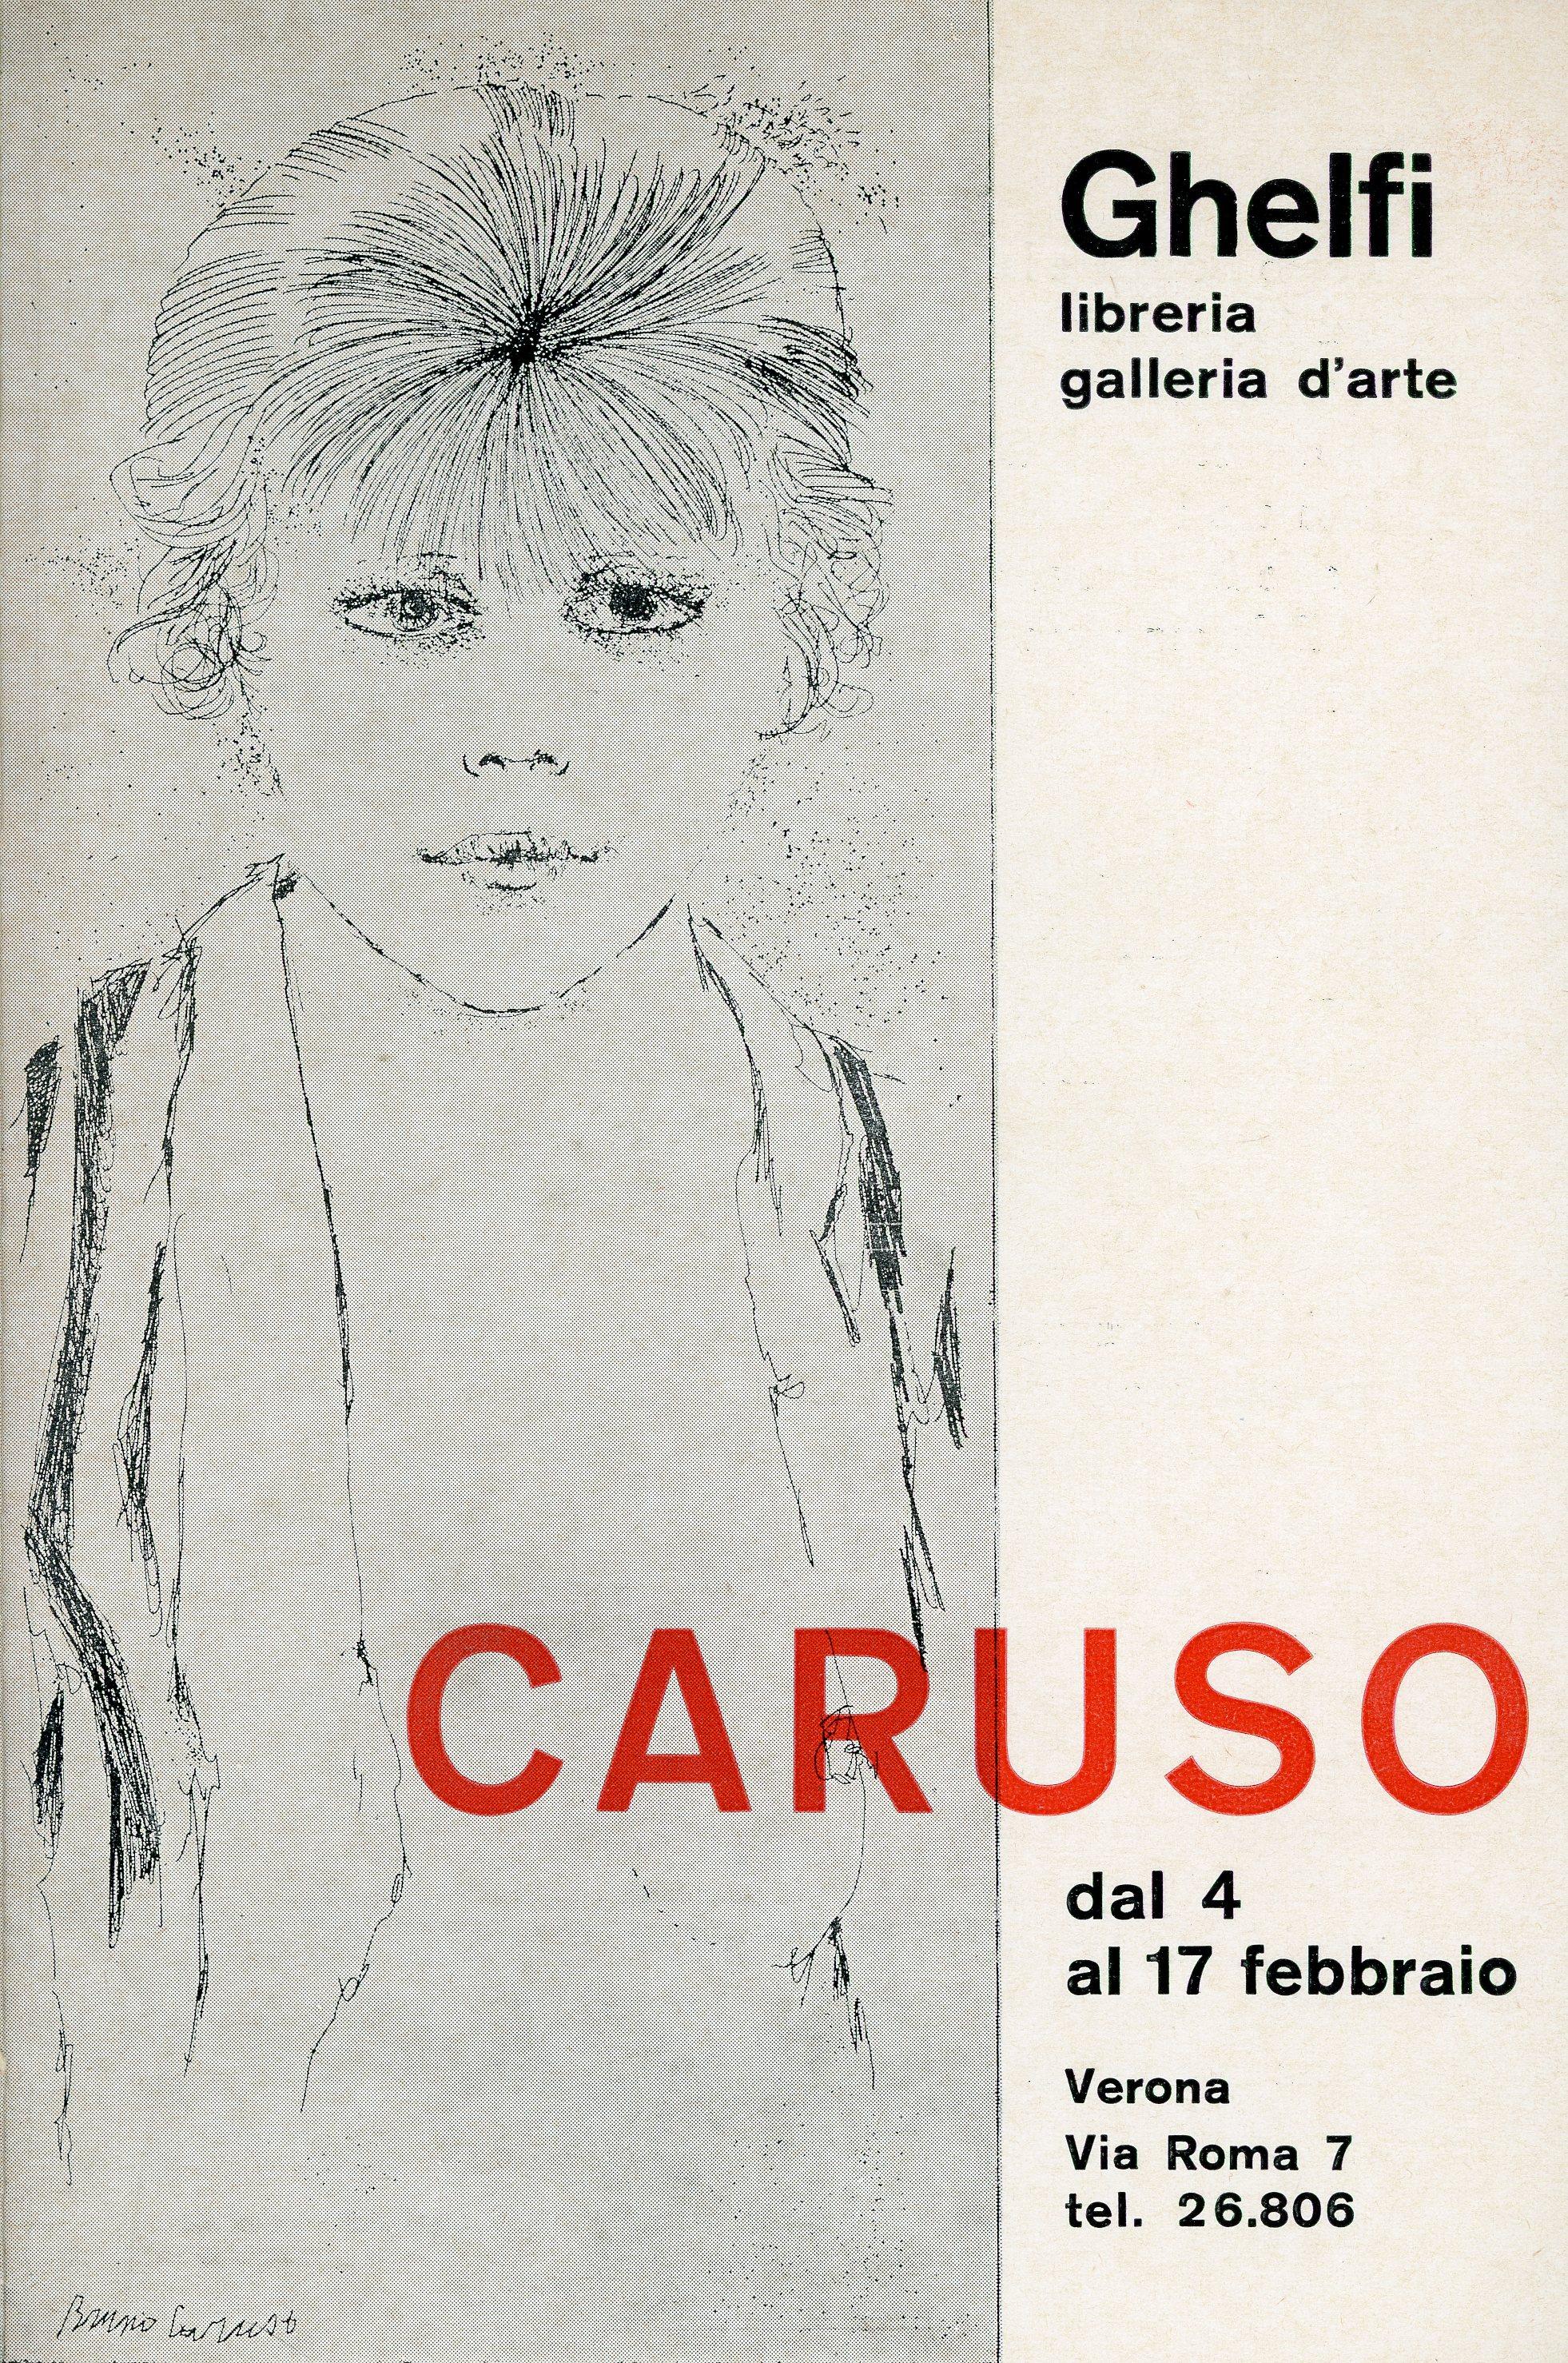 1967-02 Libreria Ghelfi - Bruno Caruso_01.jpg